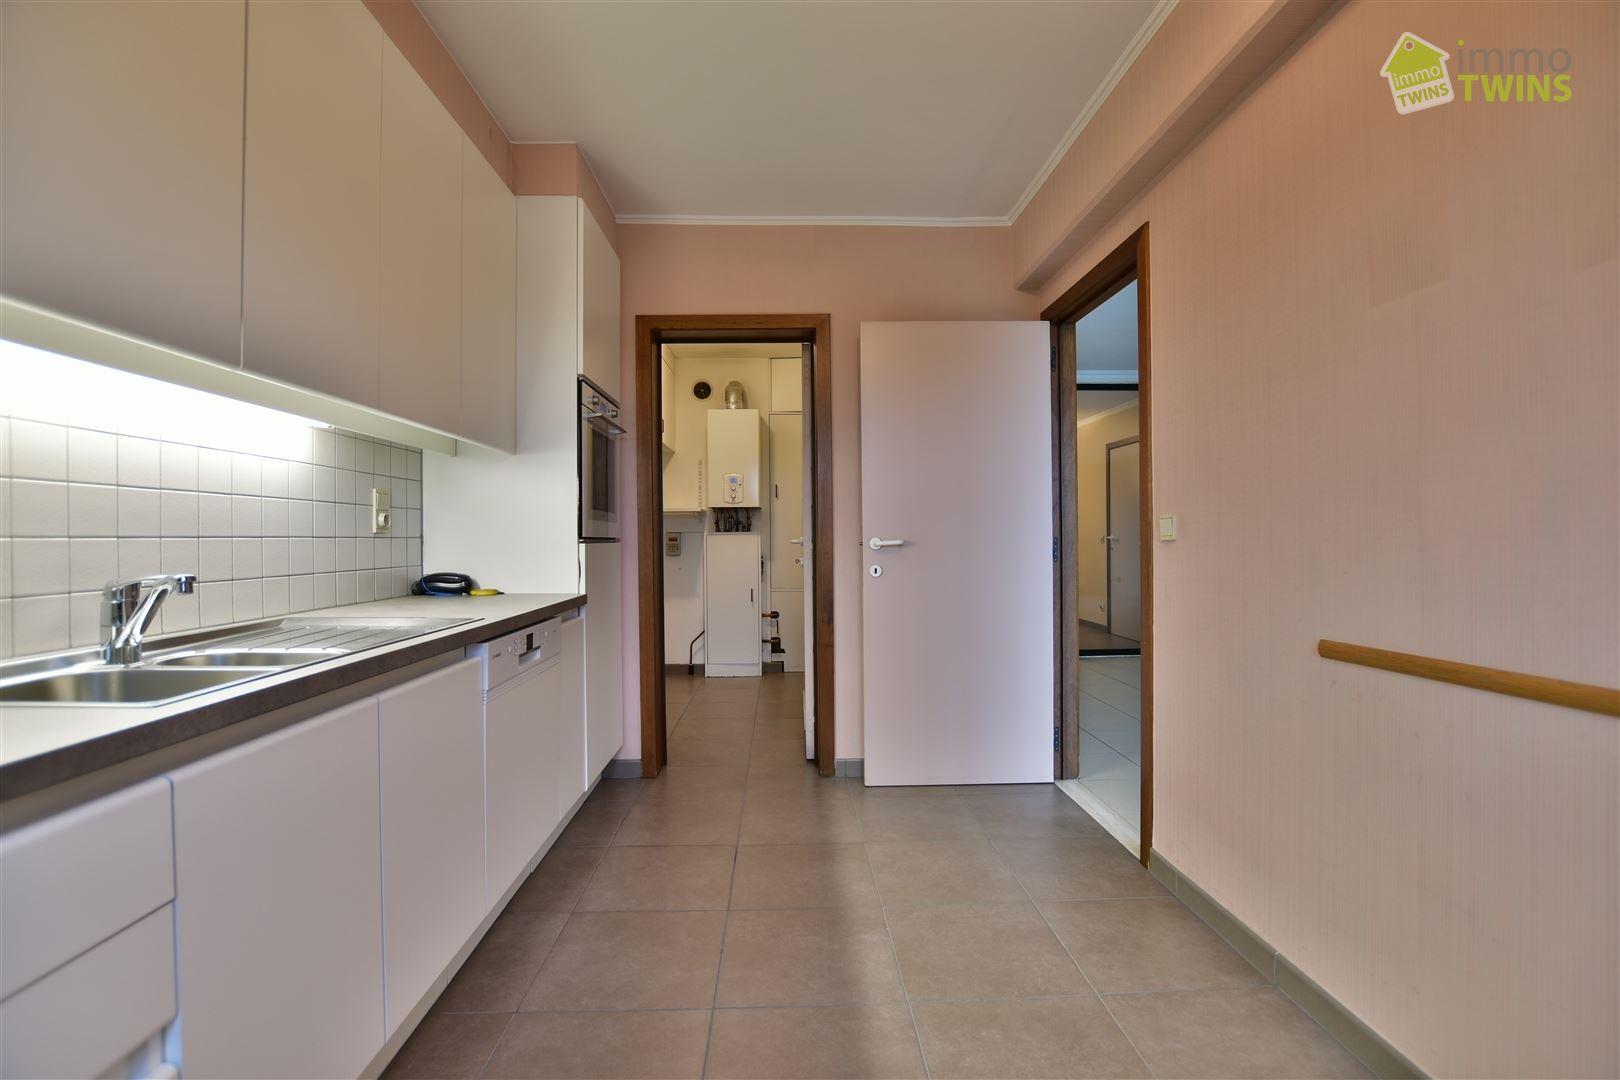 Foto 9 : Appartement te 9200 DENDERMONDE (België) - Prijs € 725